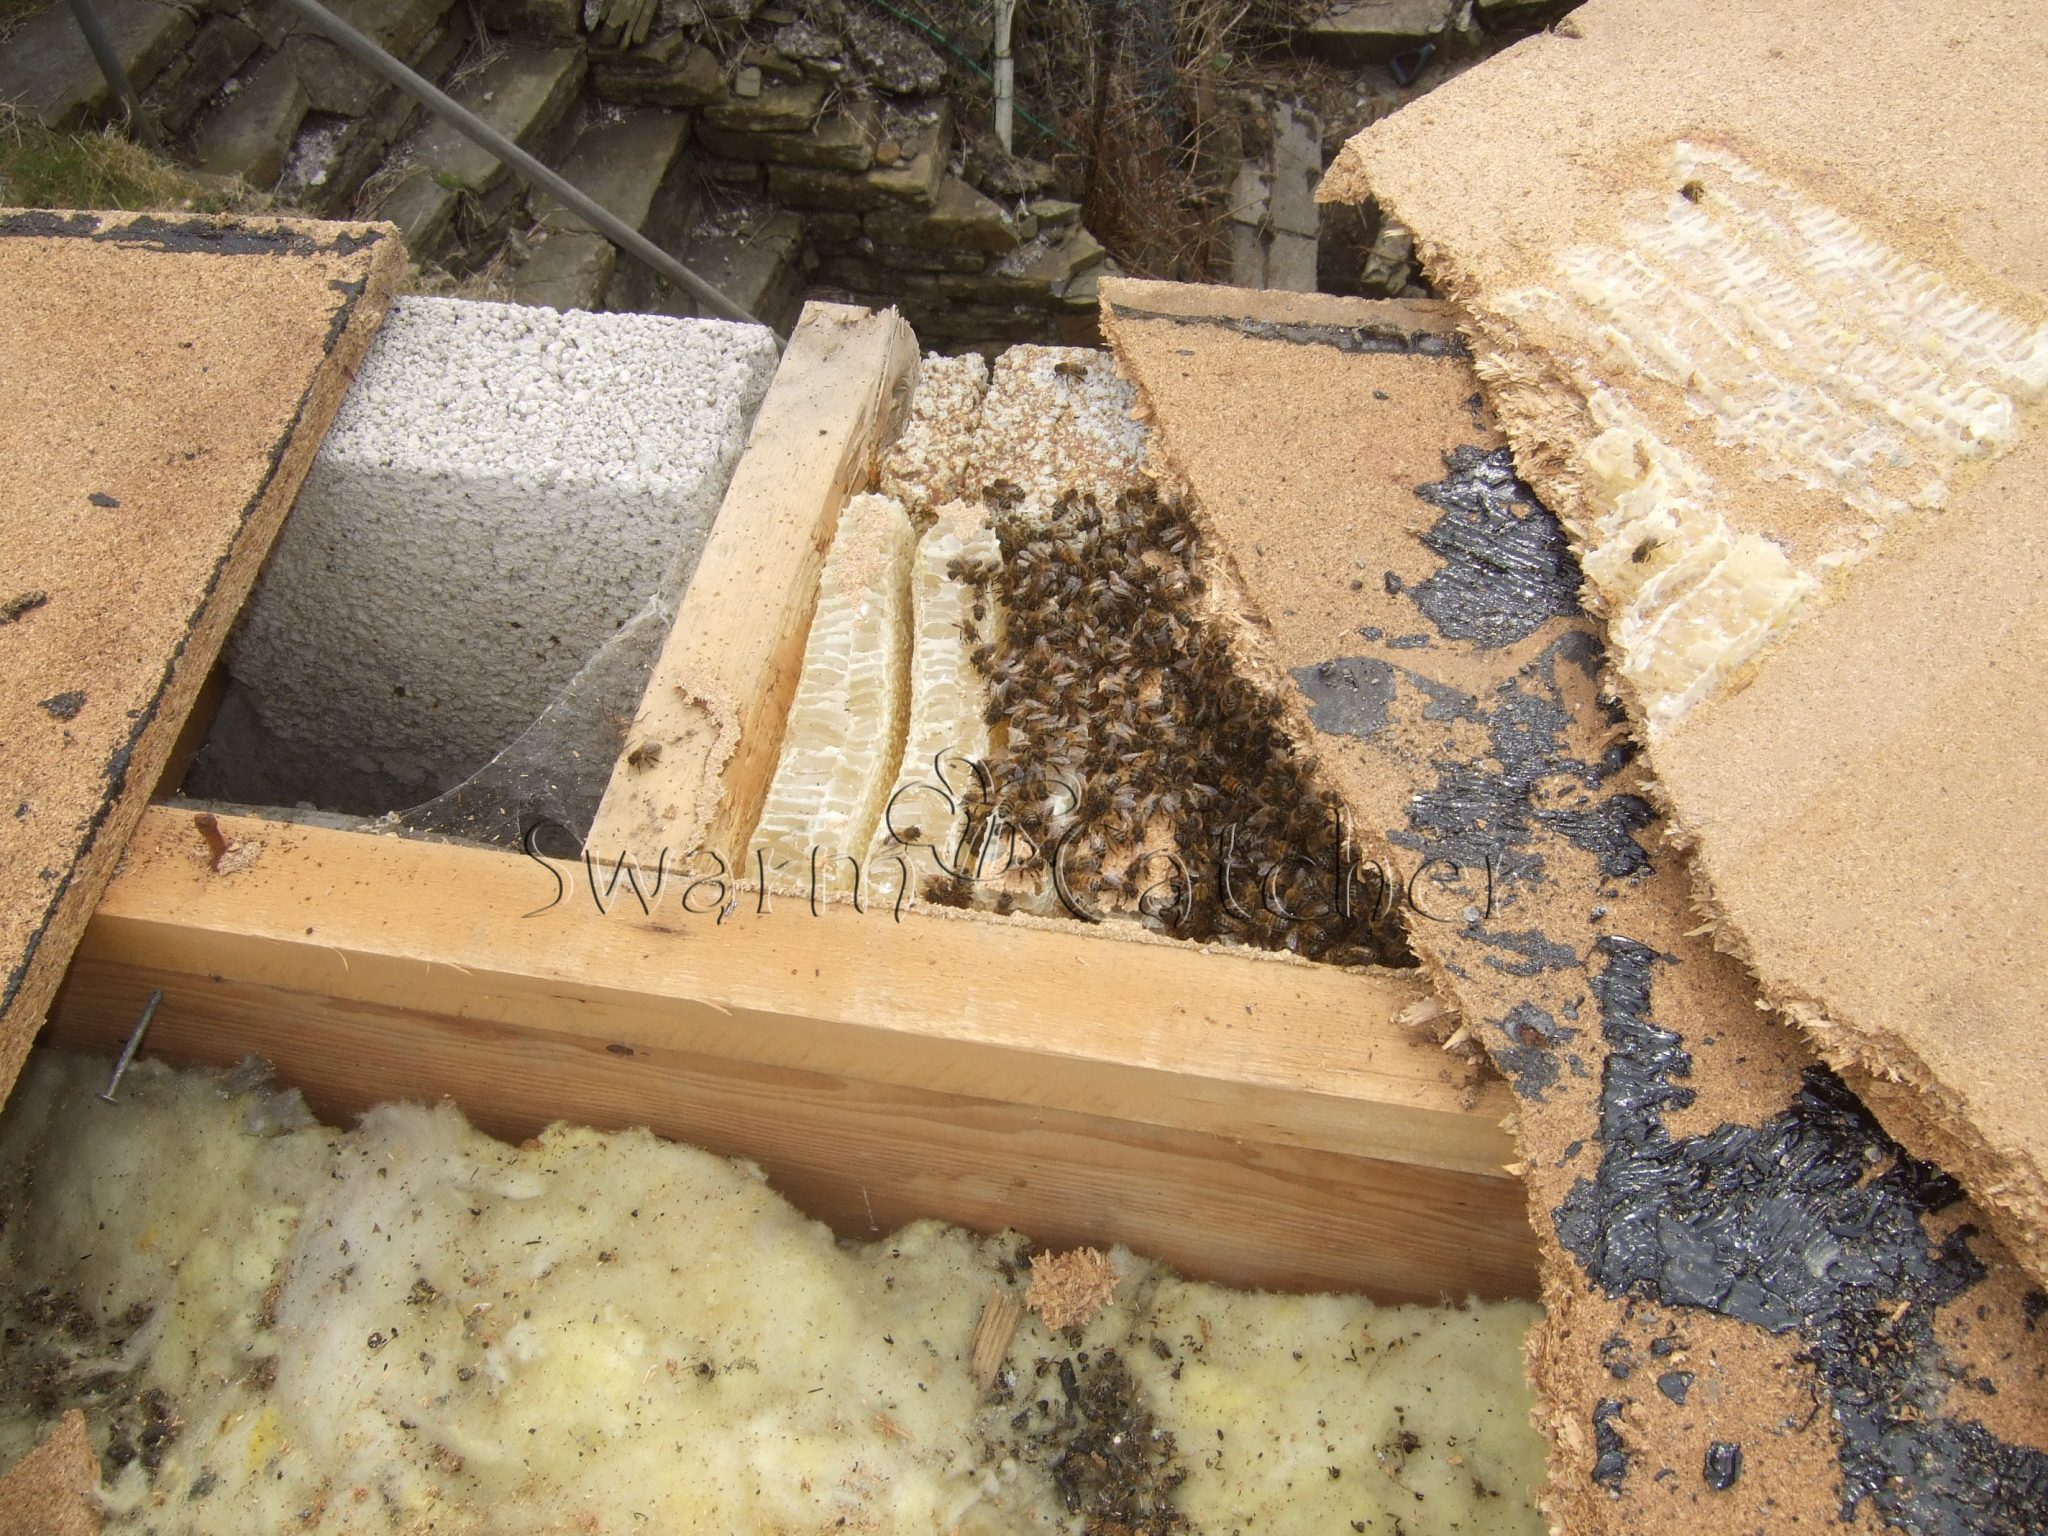 Honey bee cutout - flat roof